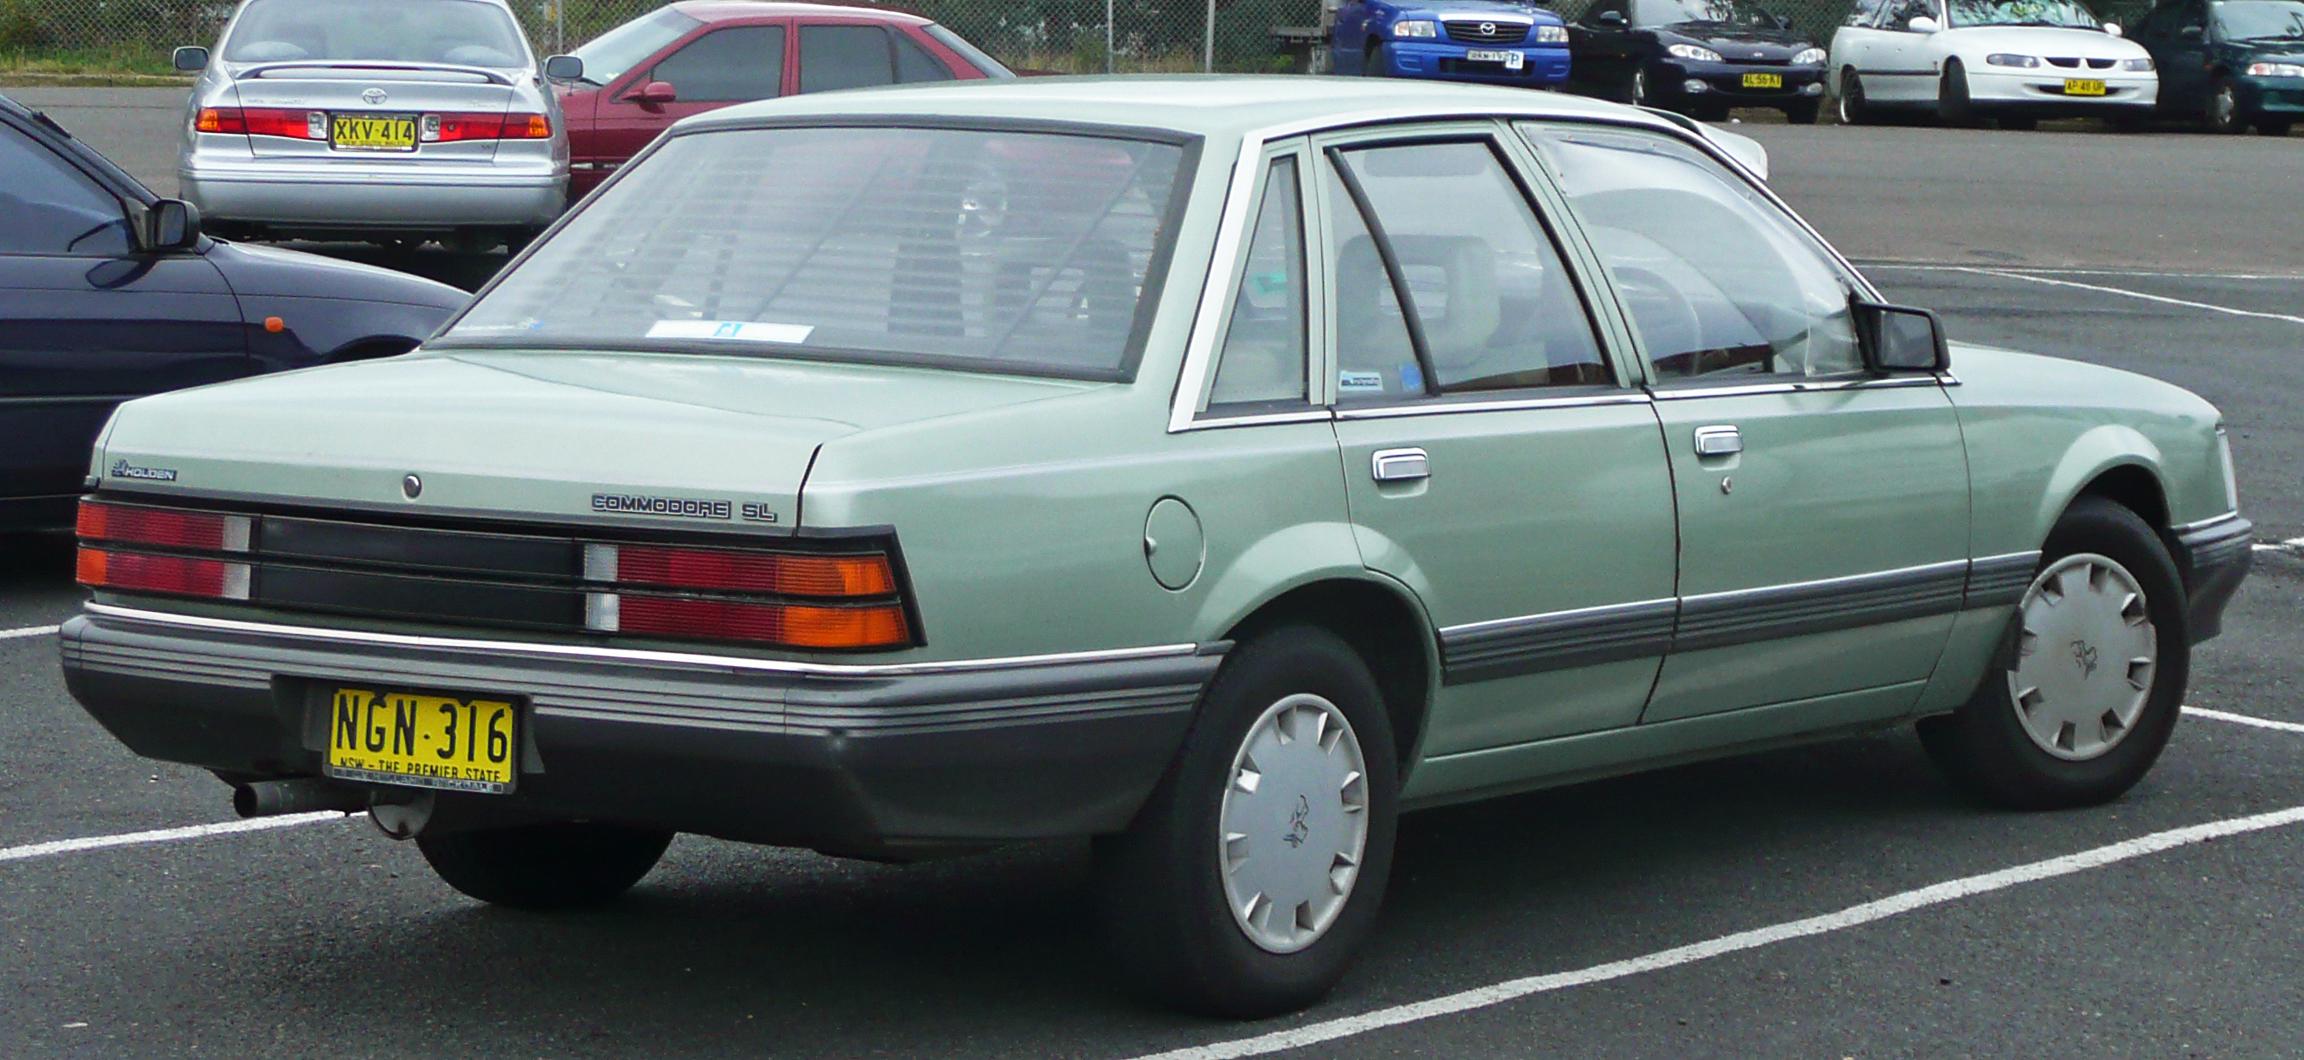 file19841986 holden vk commodore sl sedan 03jpg